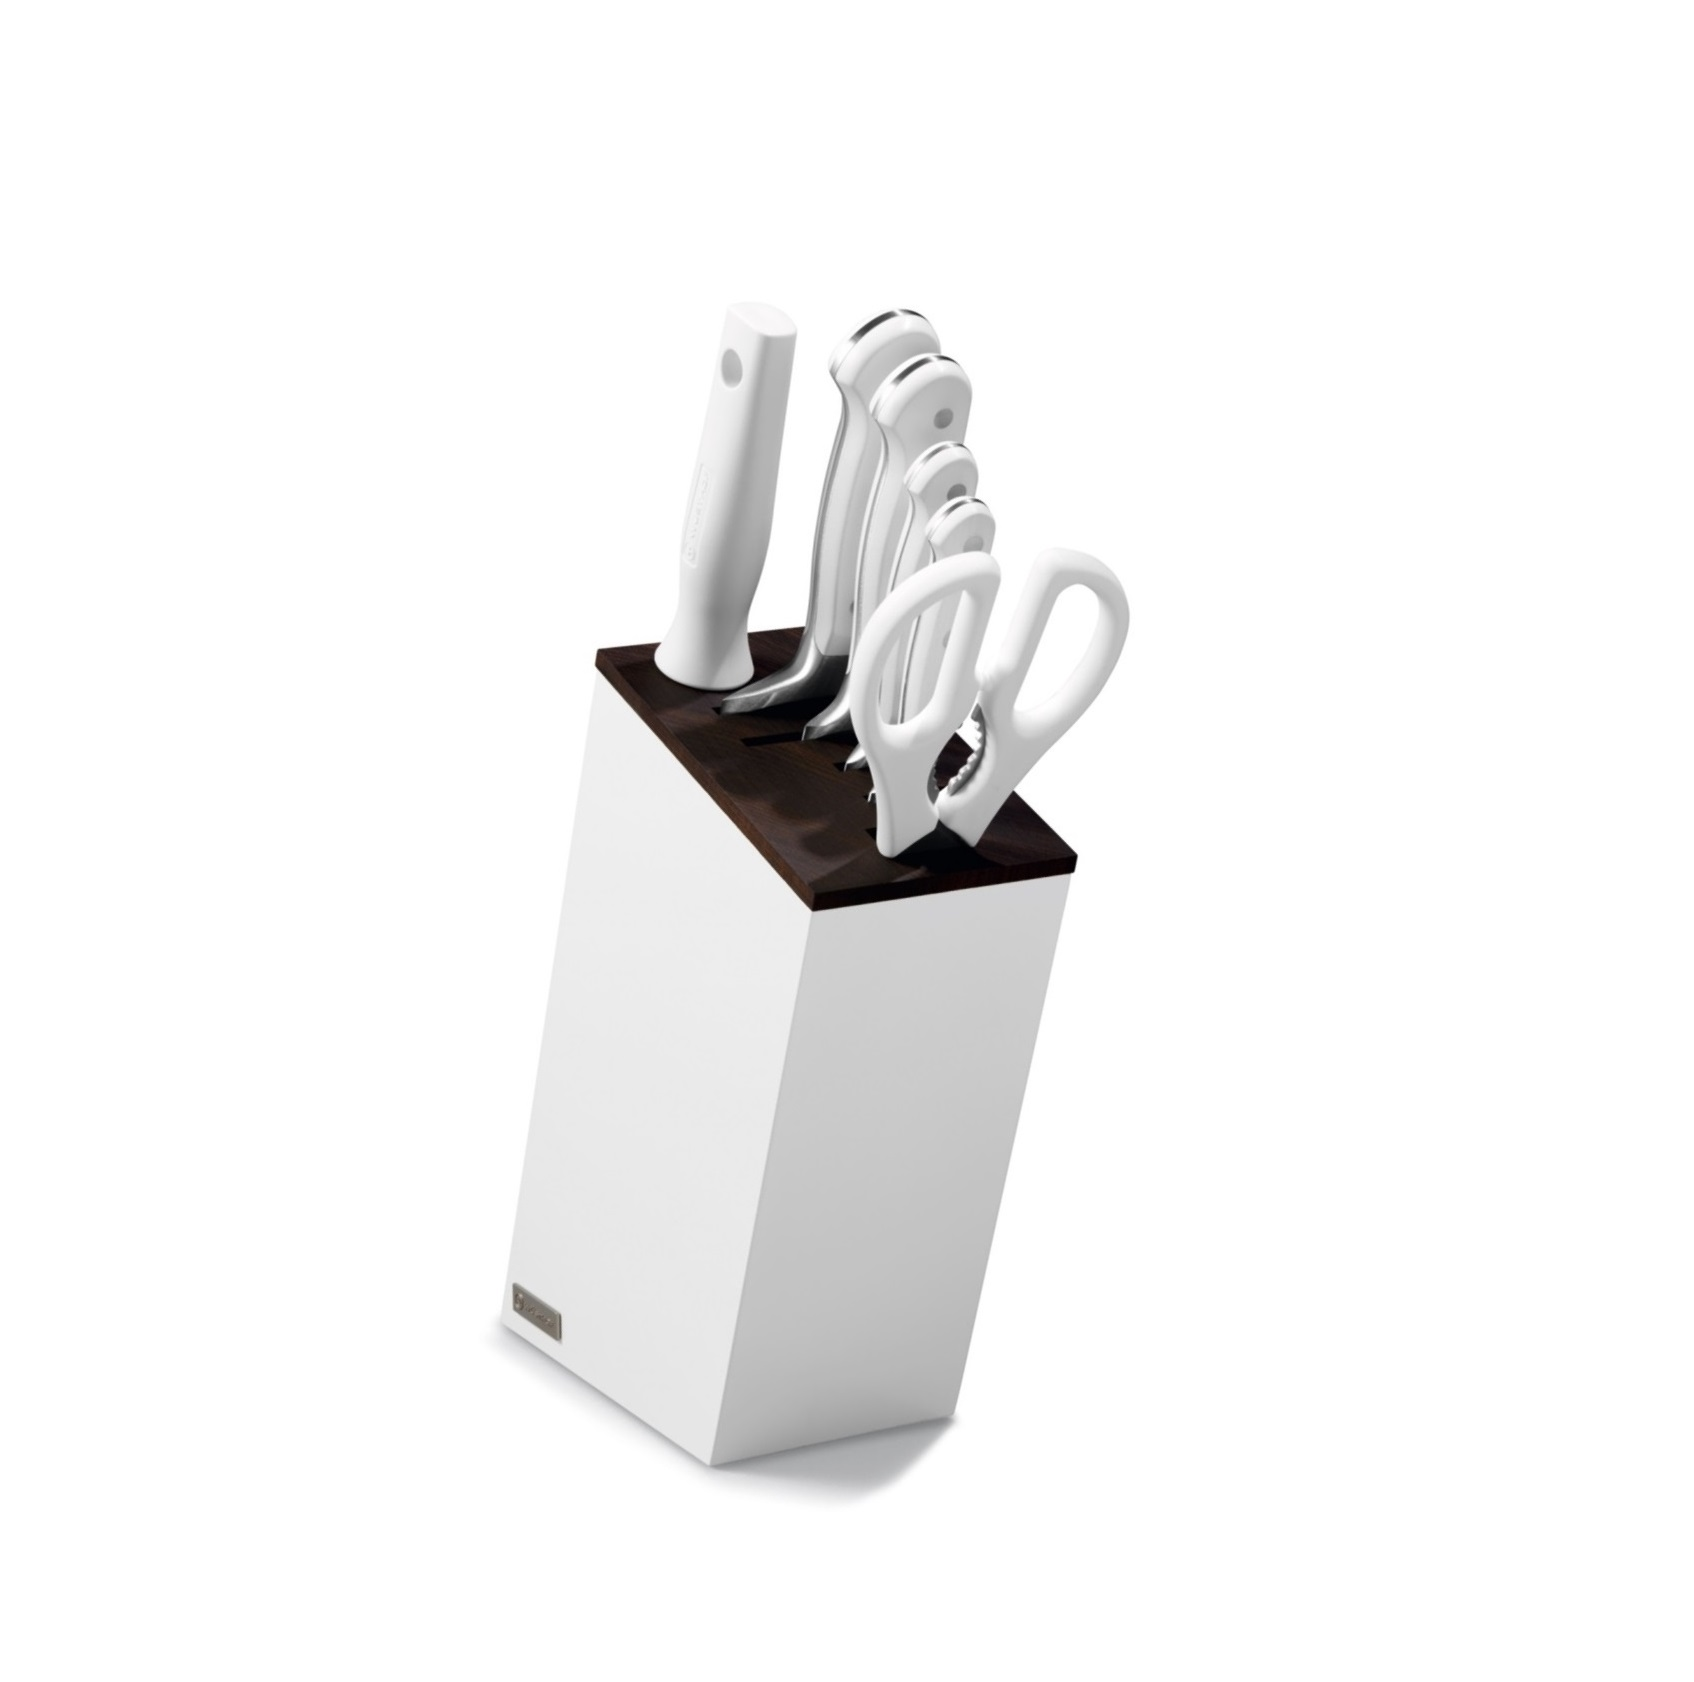 Blok s noži CLASSIC White 6 ks - verze Nůž na chléb - Wüsthof Dreizack Solingen